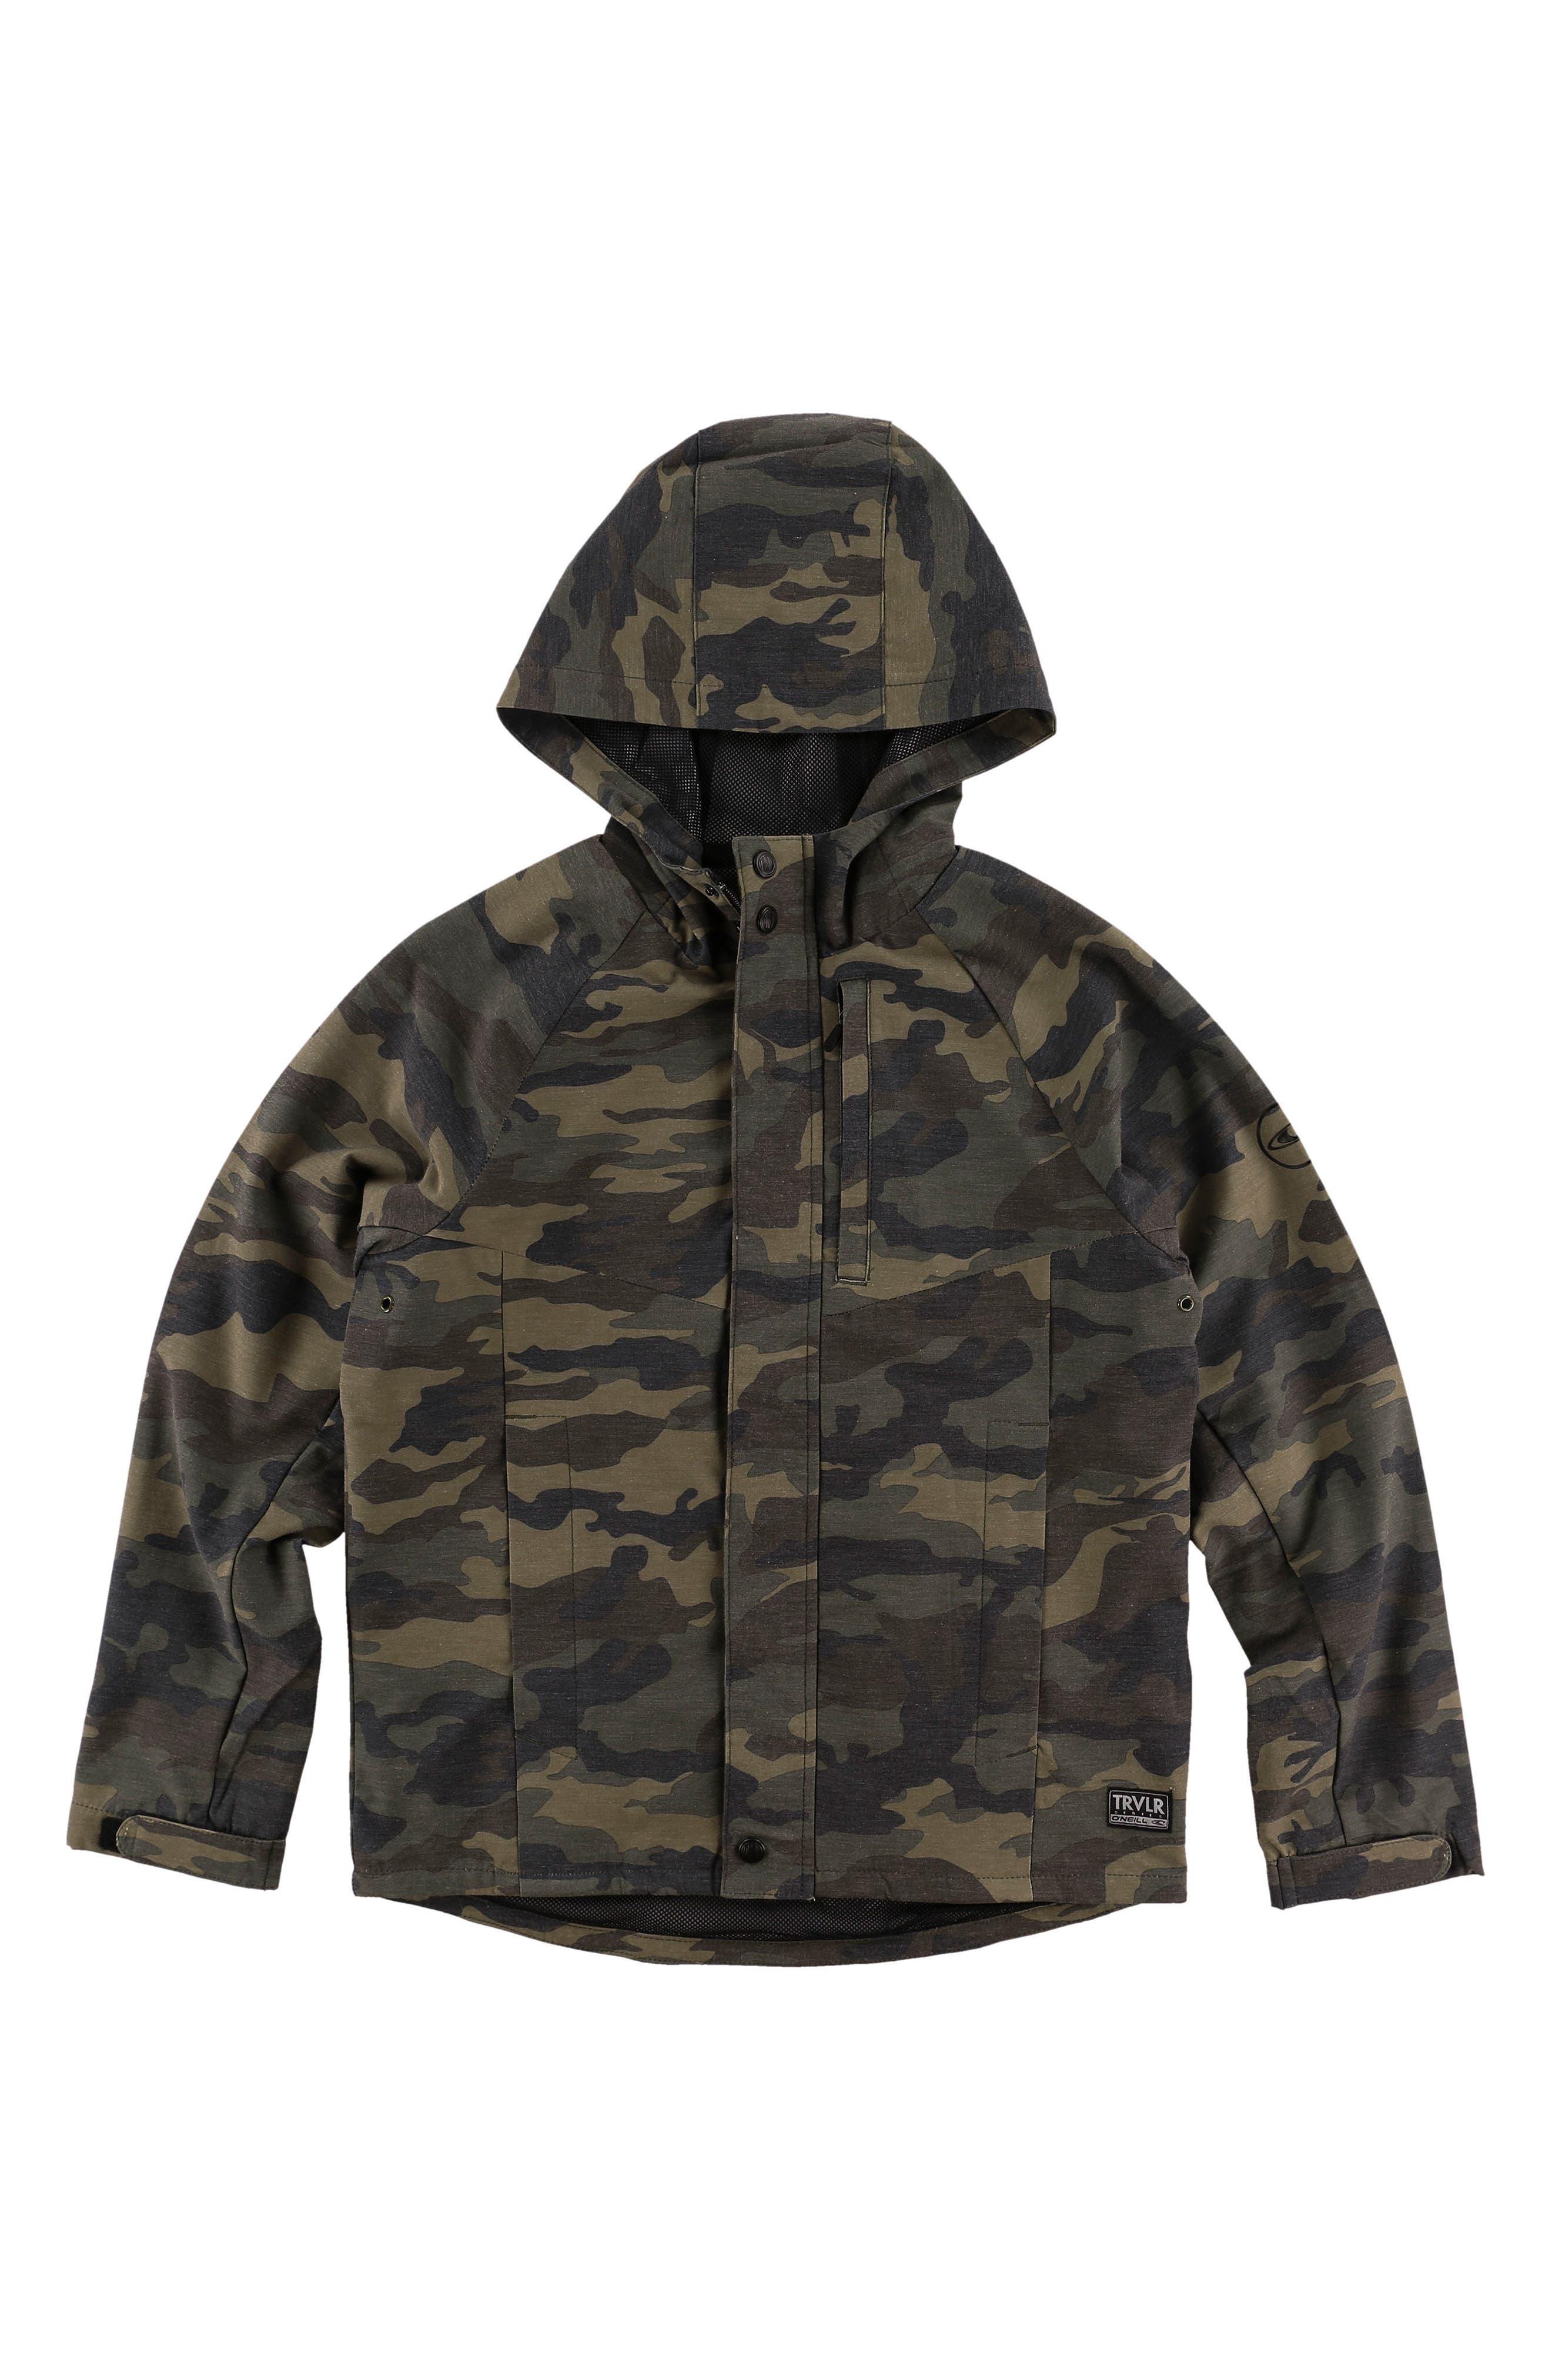 Alternate Image 1 Selected - O'Neill Traveler Dawn Patrol Camo Hooded Windbreaker Jacket (Big Boys)